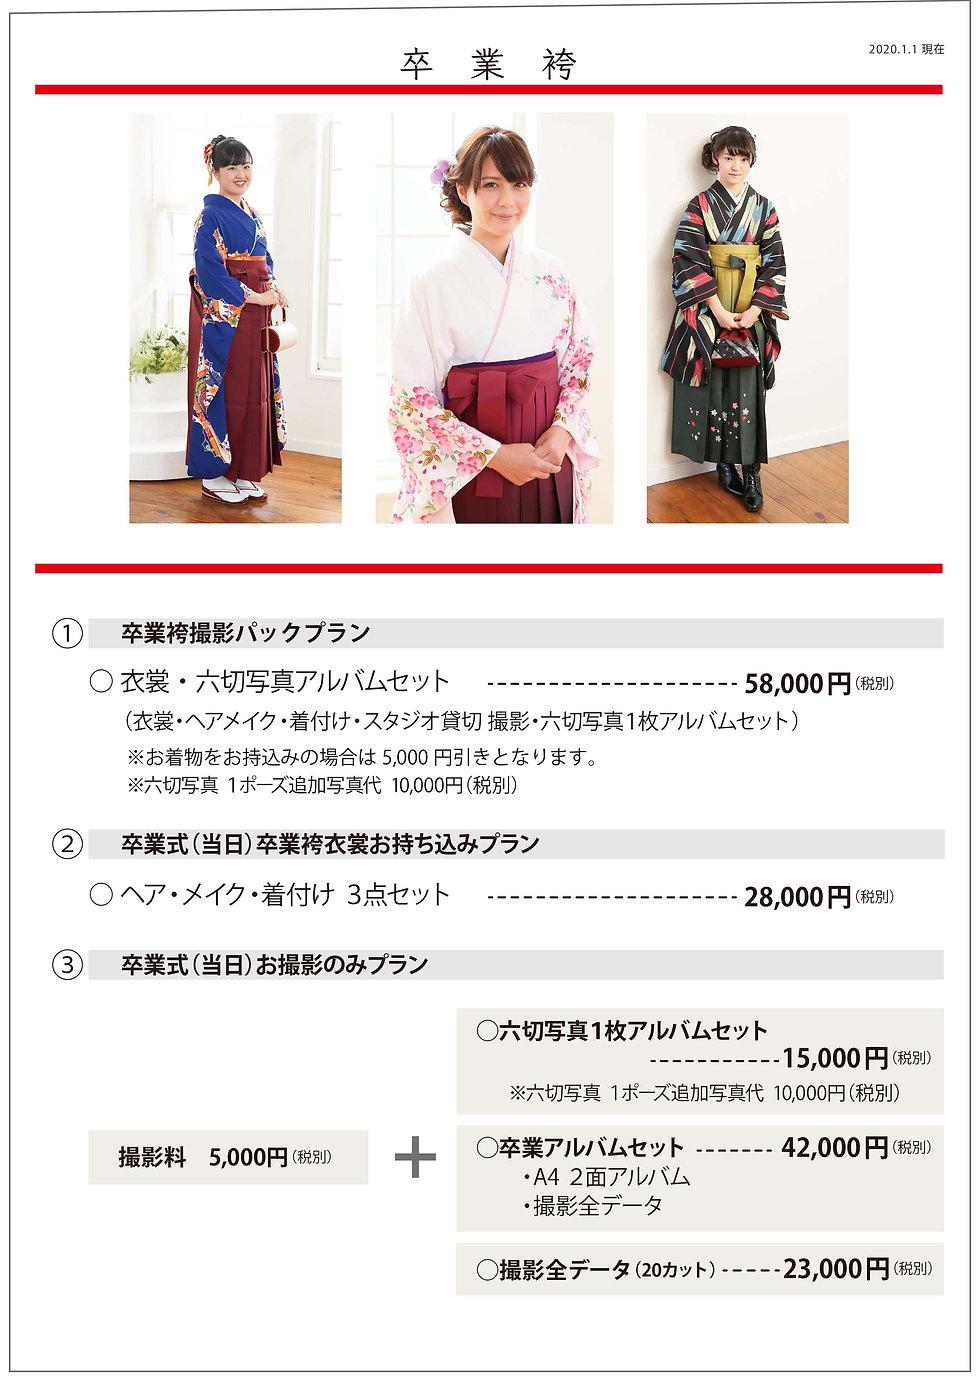 sotsugyou_plan2020.jpg